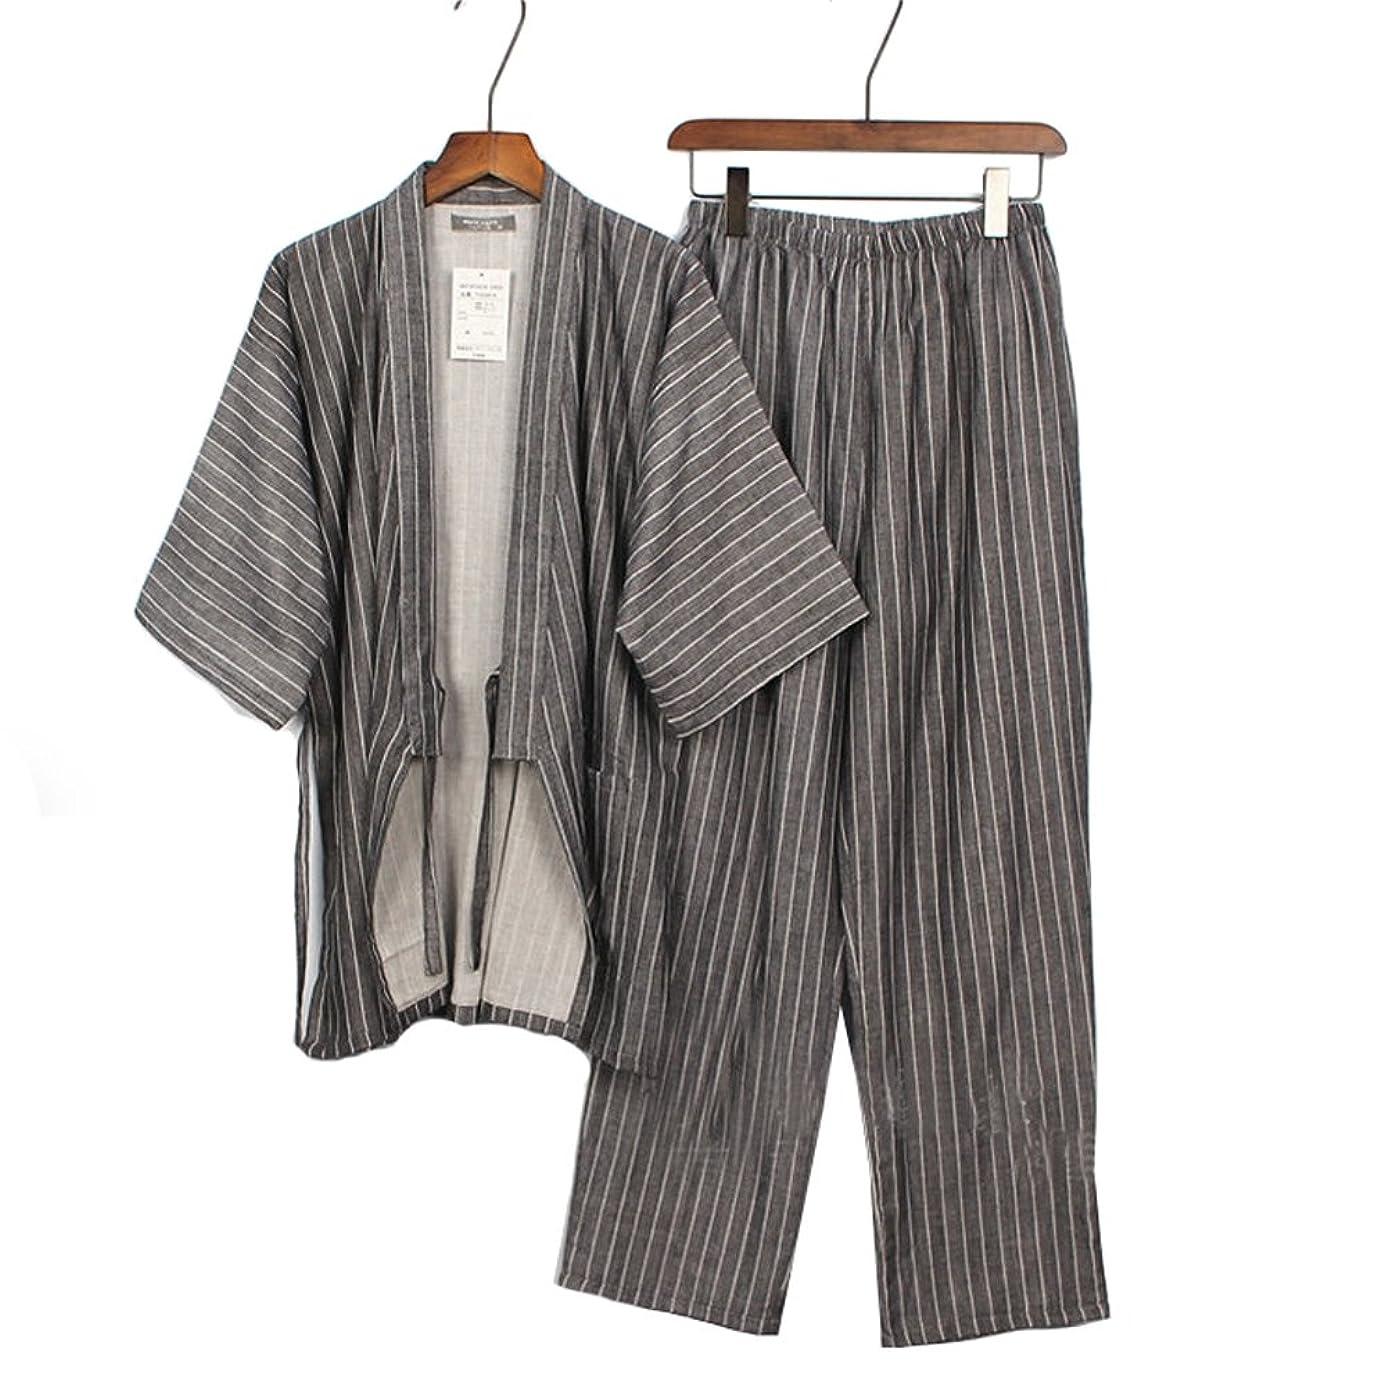 Men's Japanese Style Robes Pure Cotton Kimono Pajamas Suit Dressing Gown Set-A1